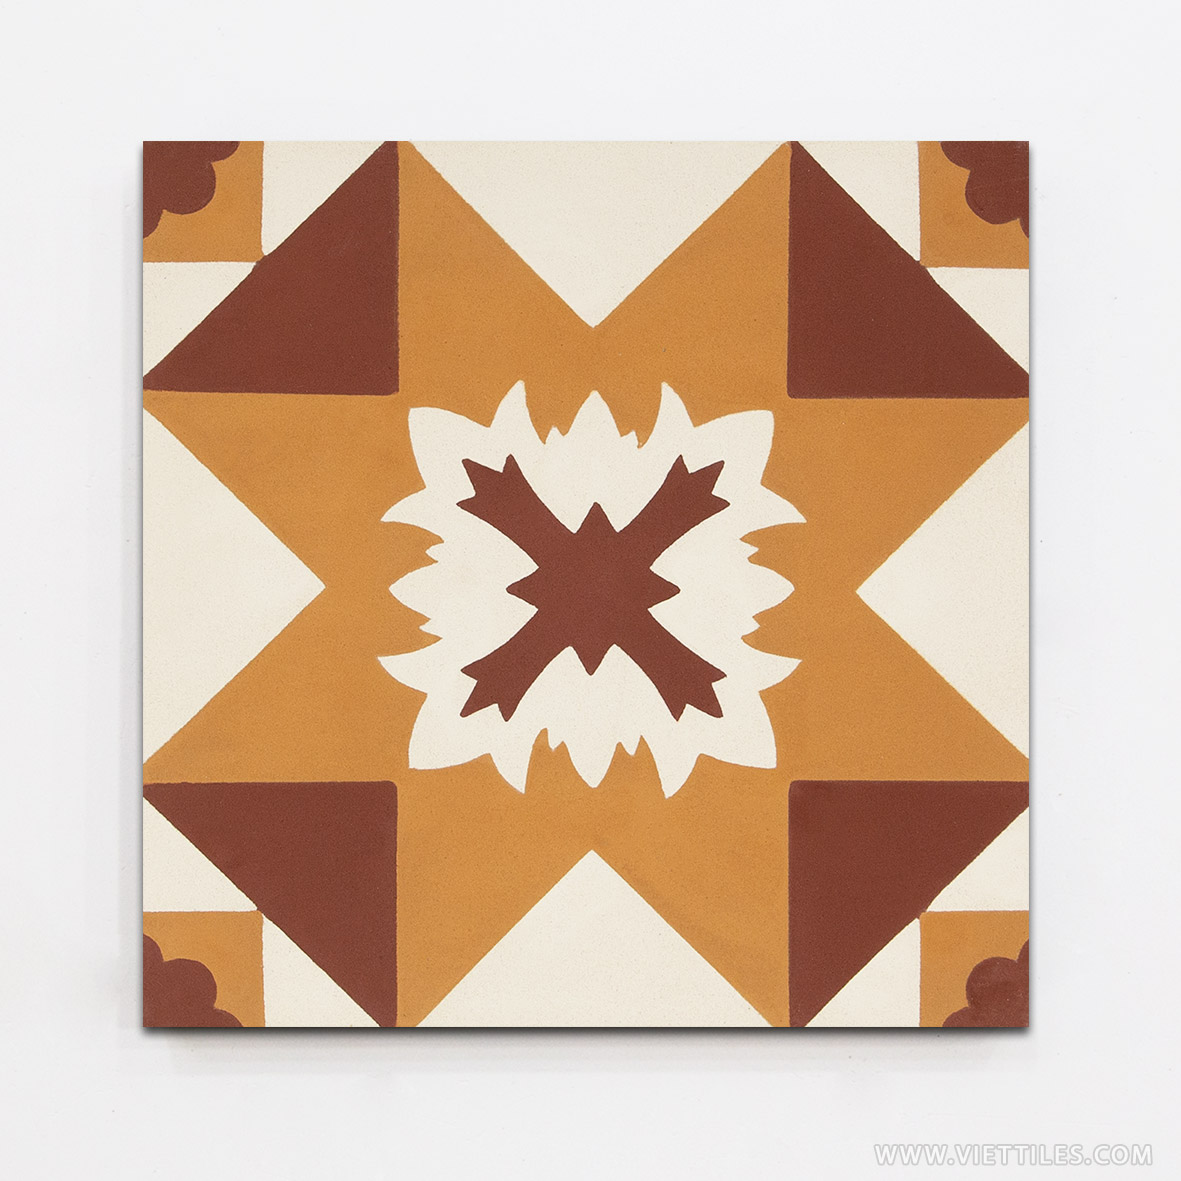 v20-999 Cement Tile